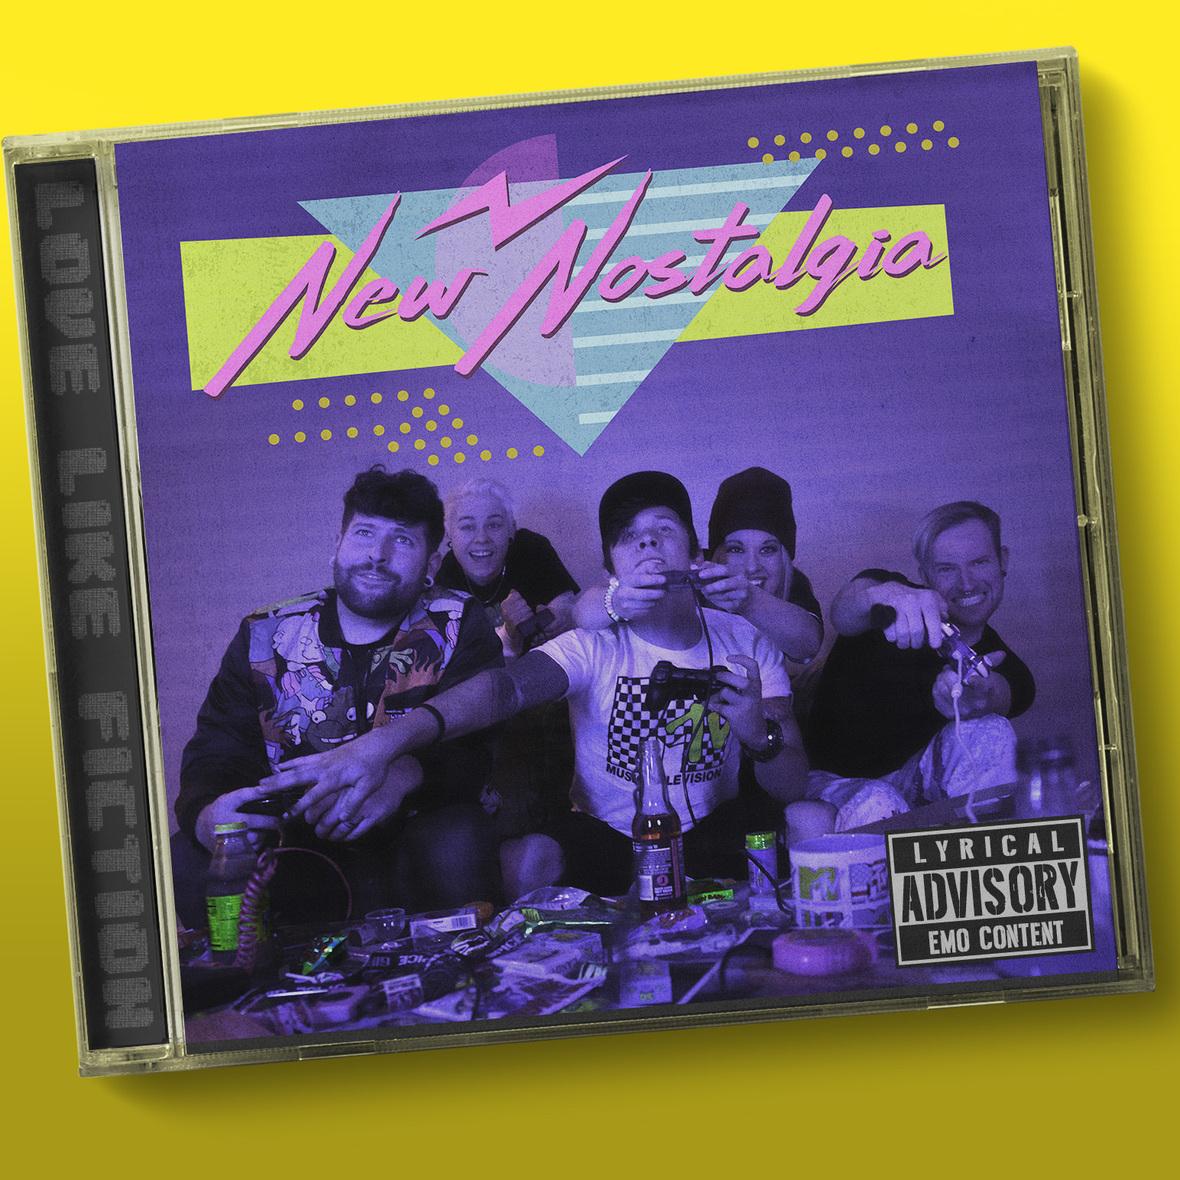 NewNostalgia Album Cover